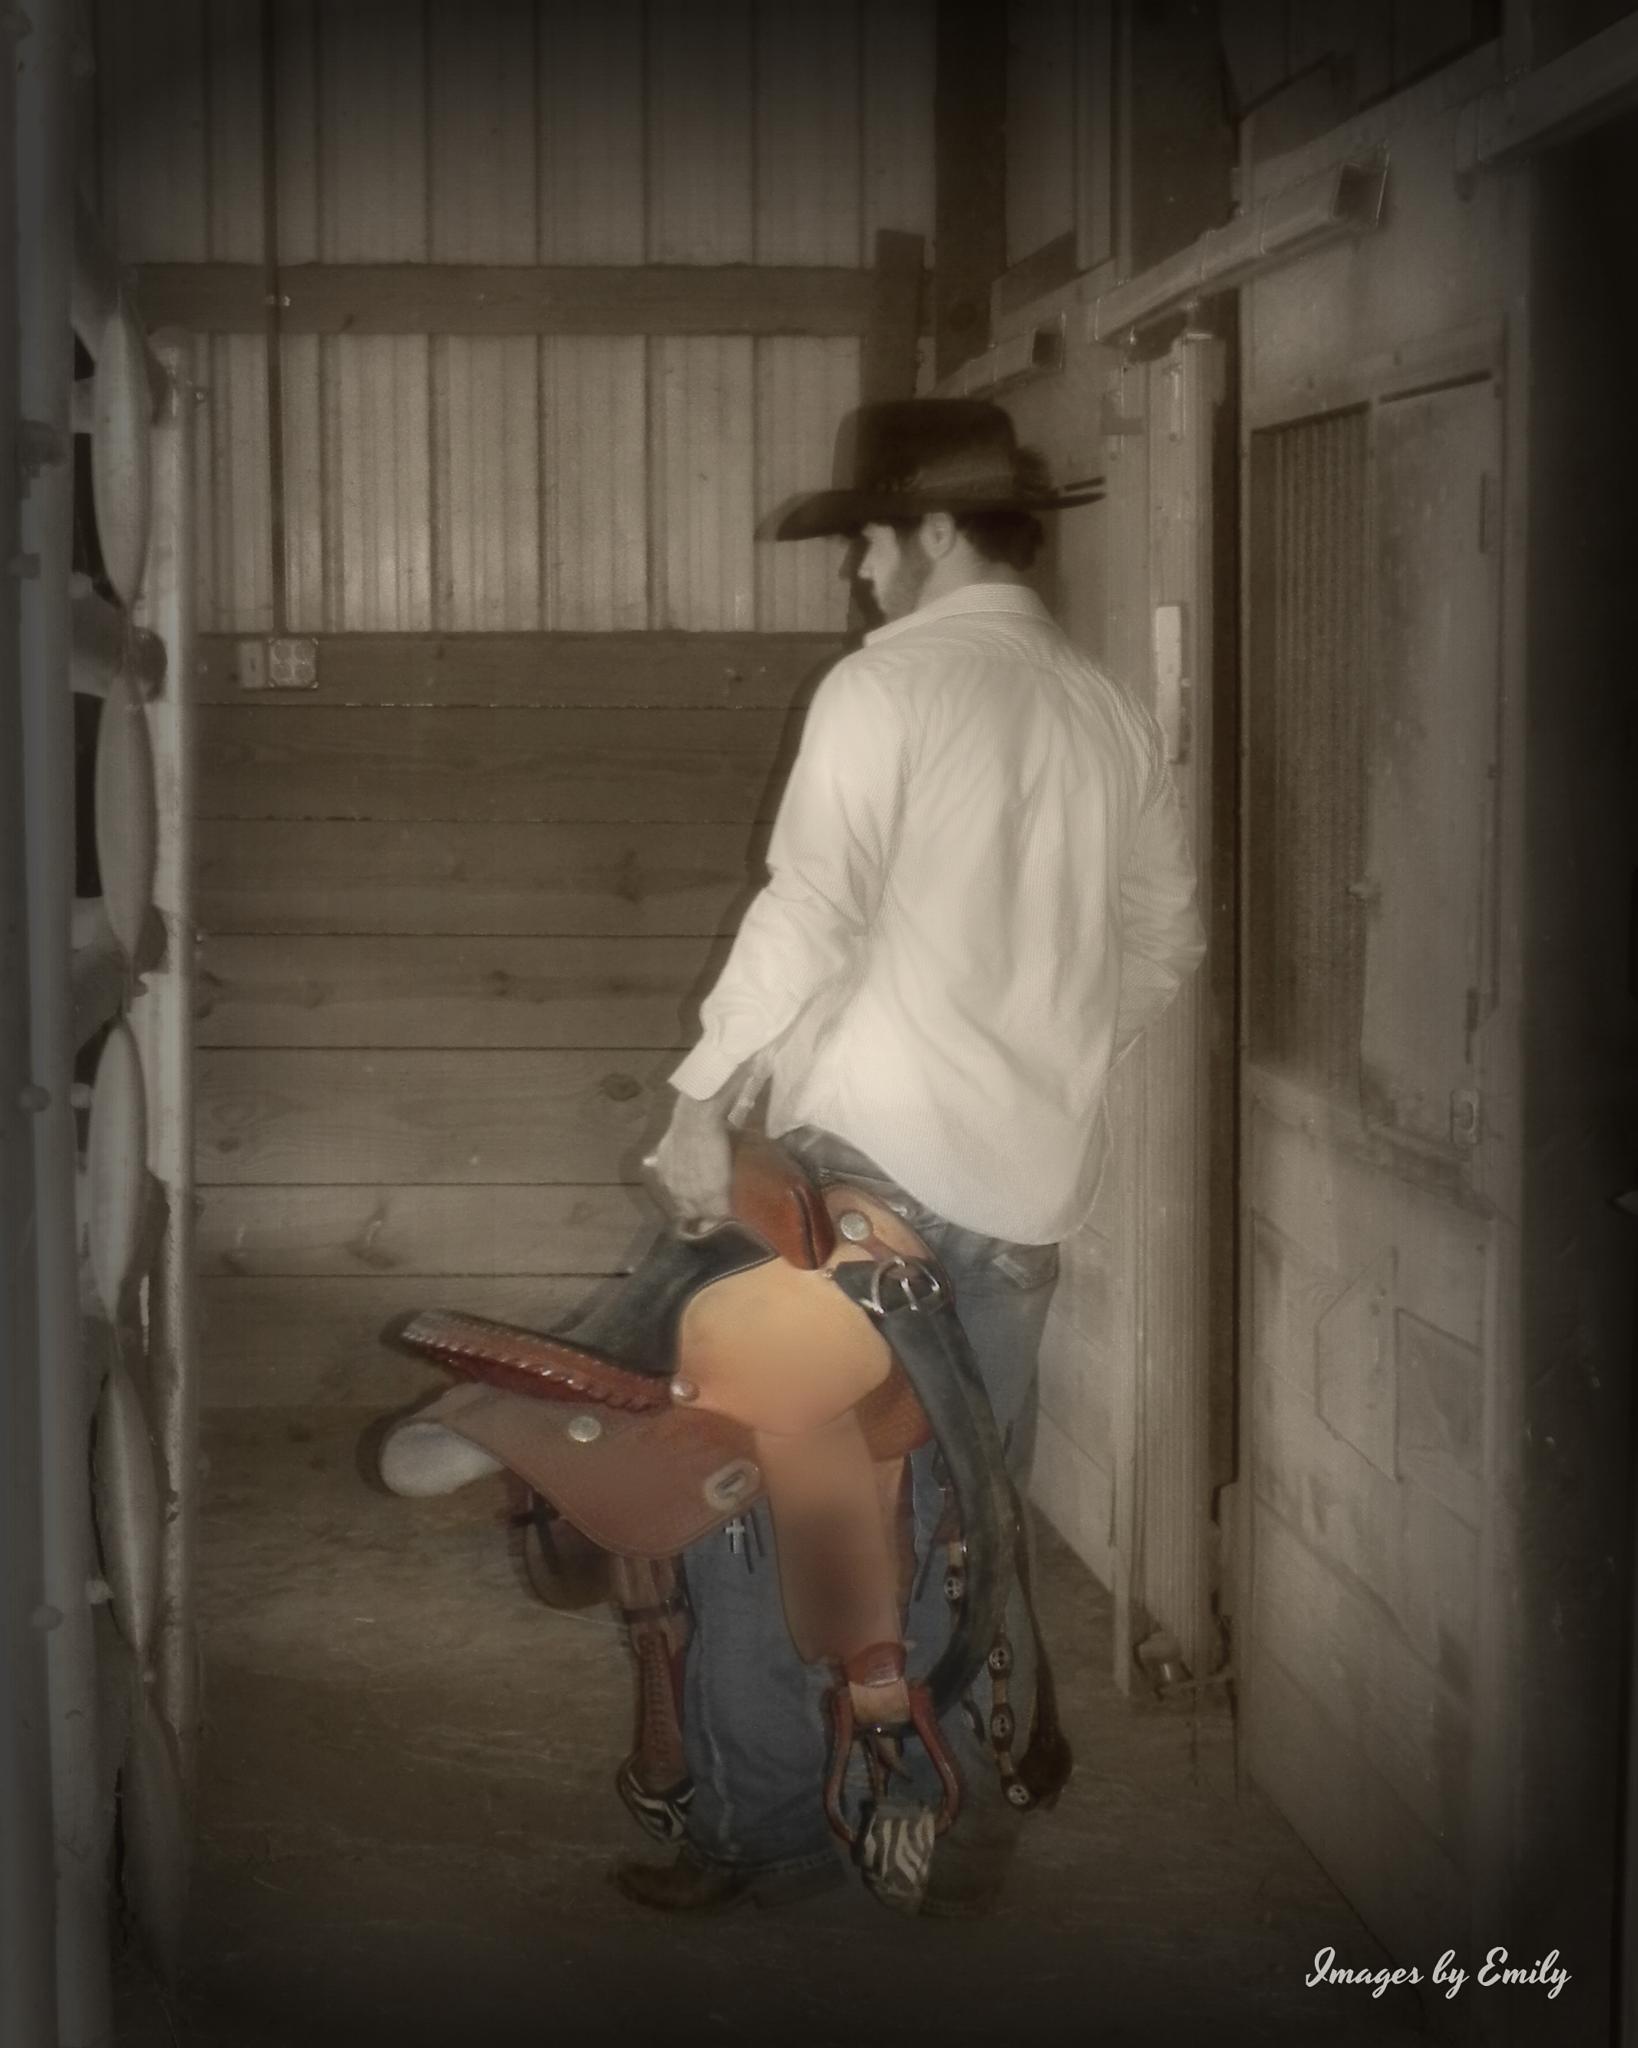 Saddle up by Emily Grant